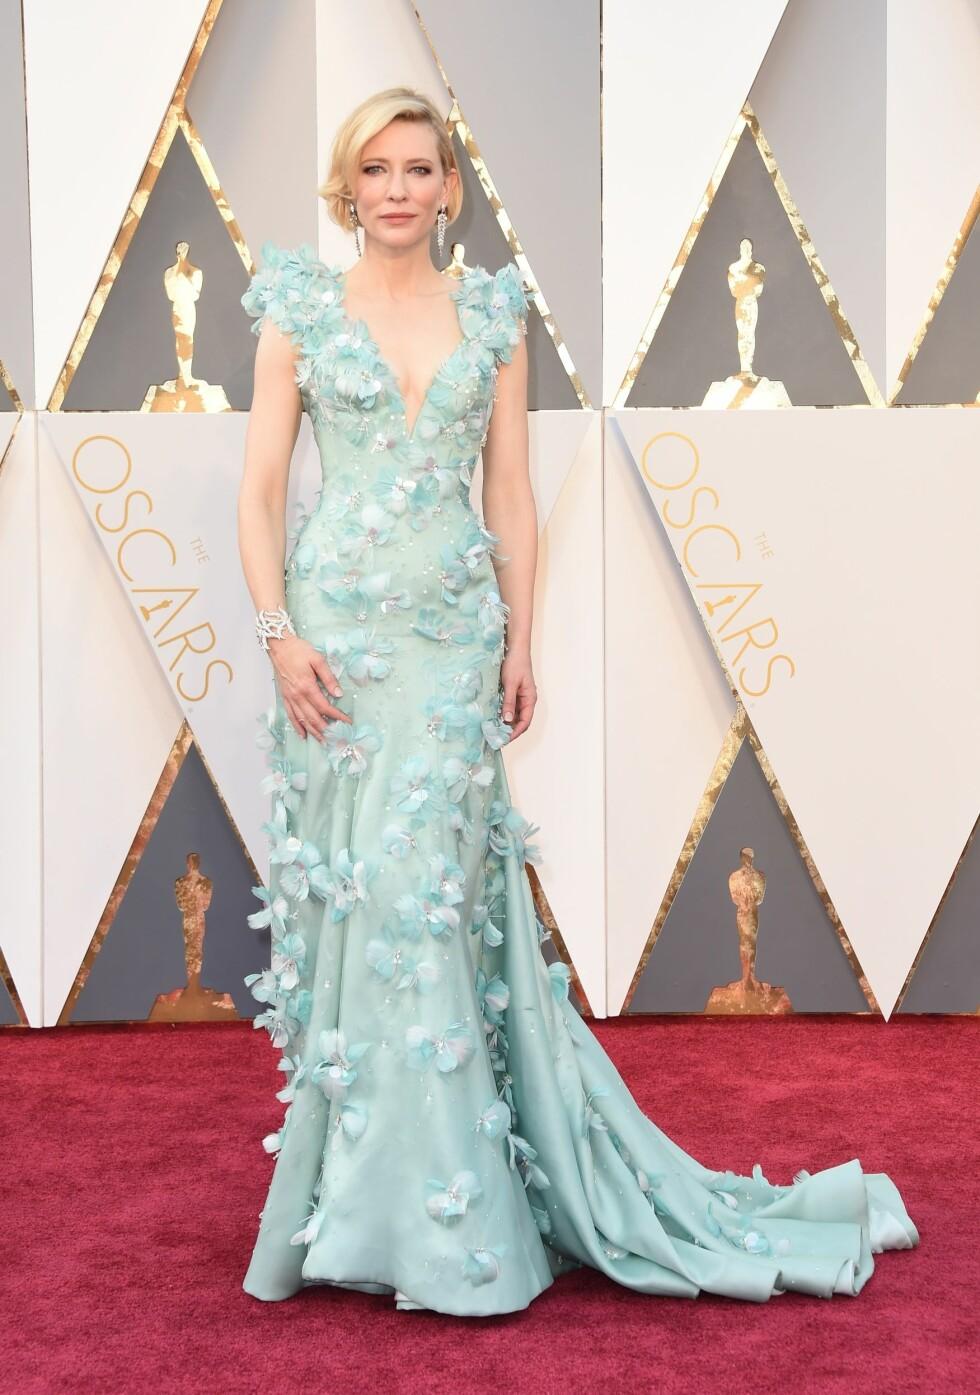 Cate Blanchett på Oscar-utdelingen i 2016. Foto: NTB Scanpix